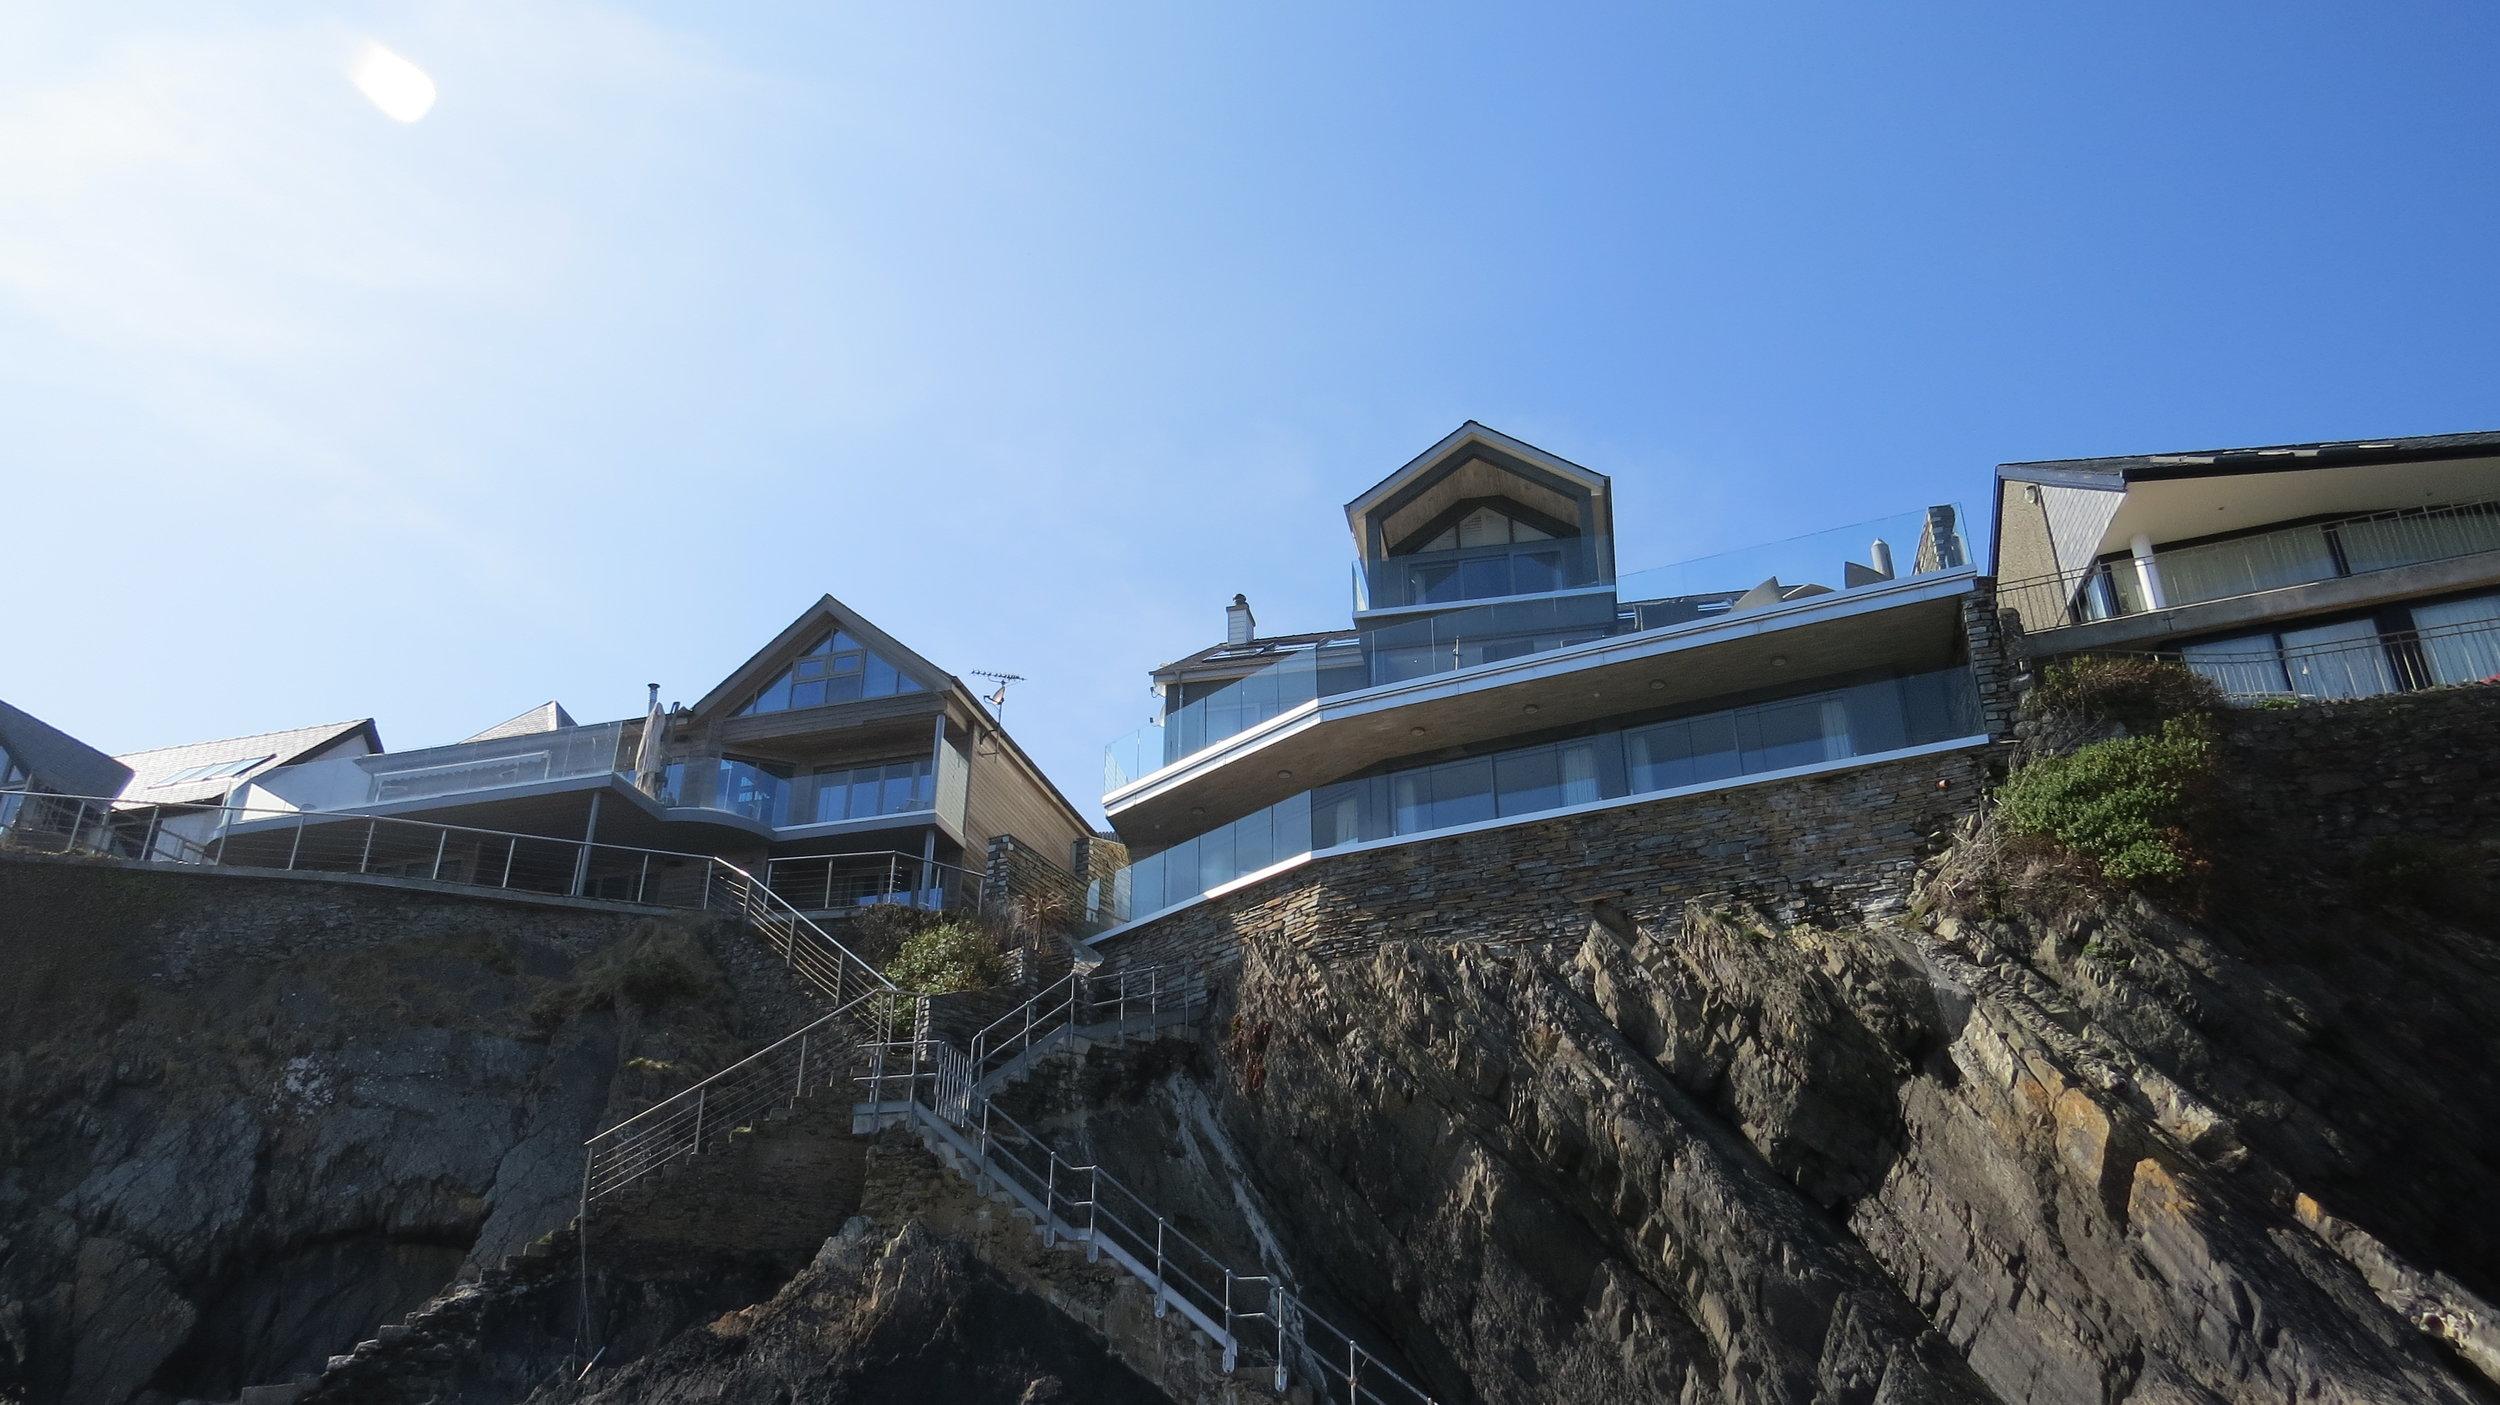 Clifftop Houses Abersoch